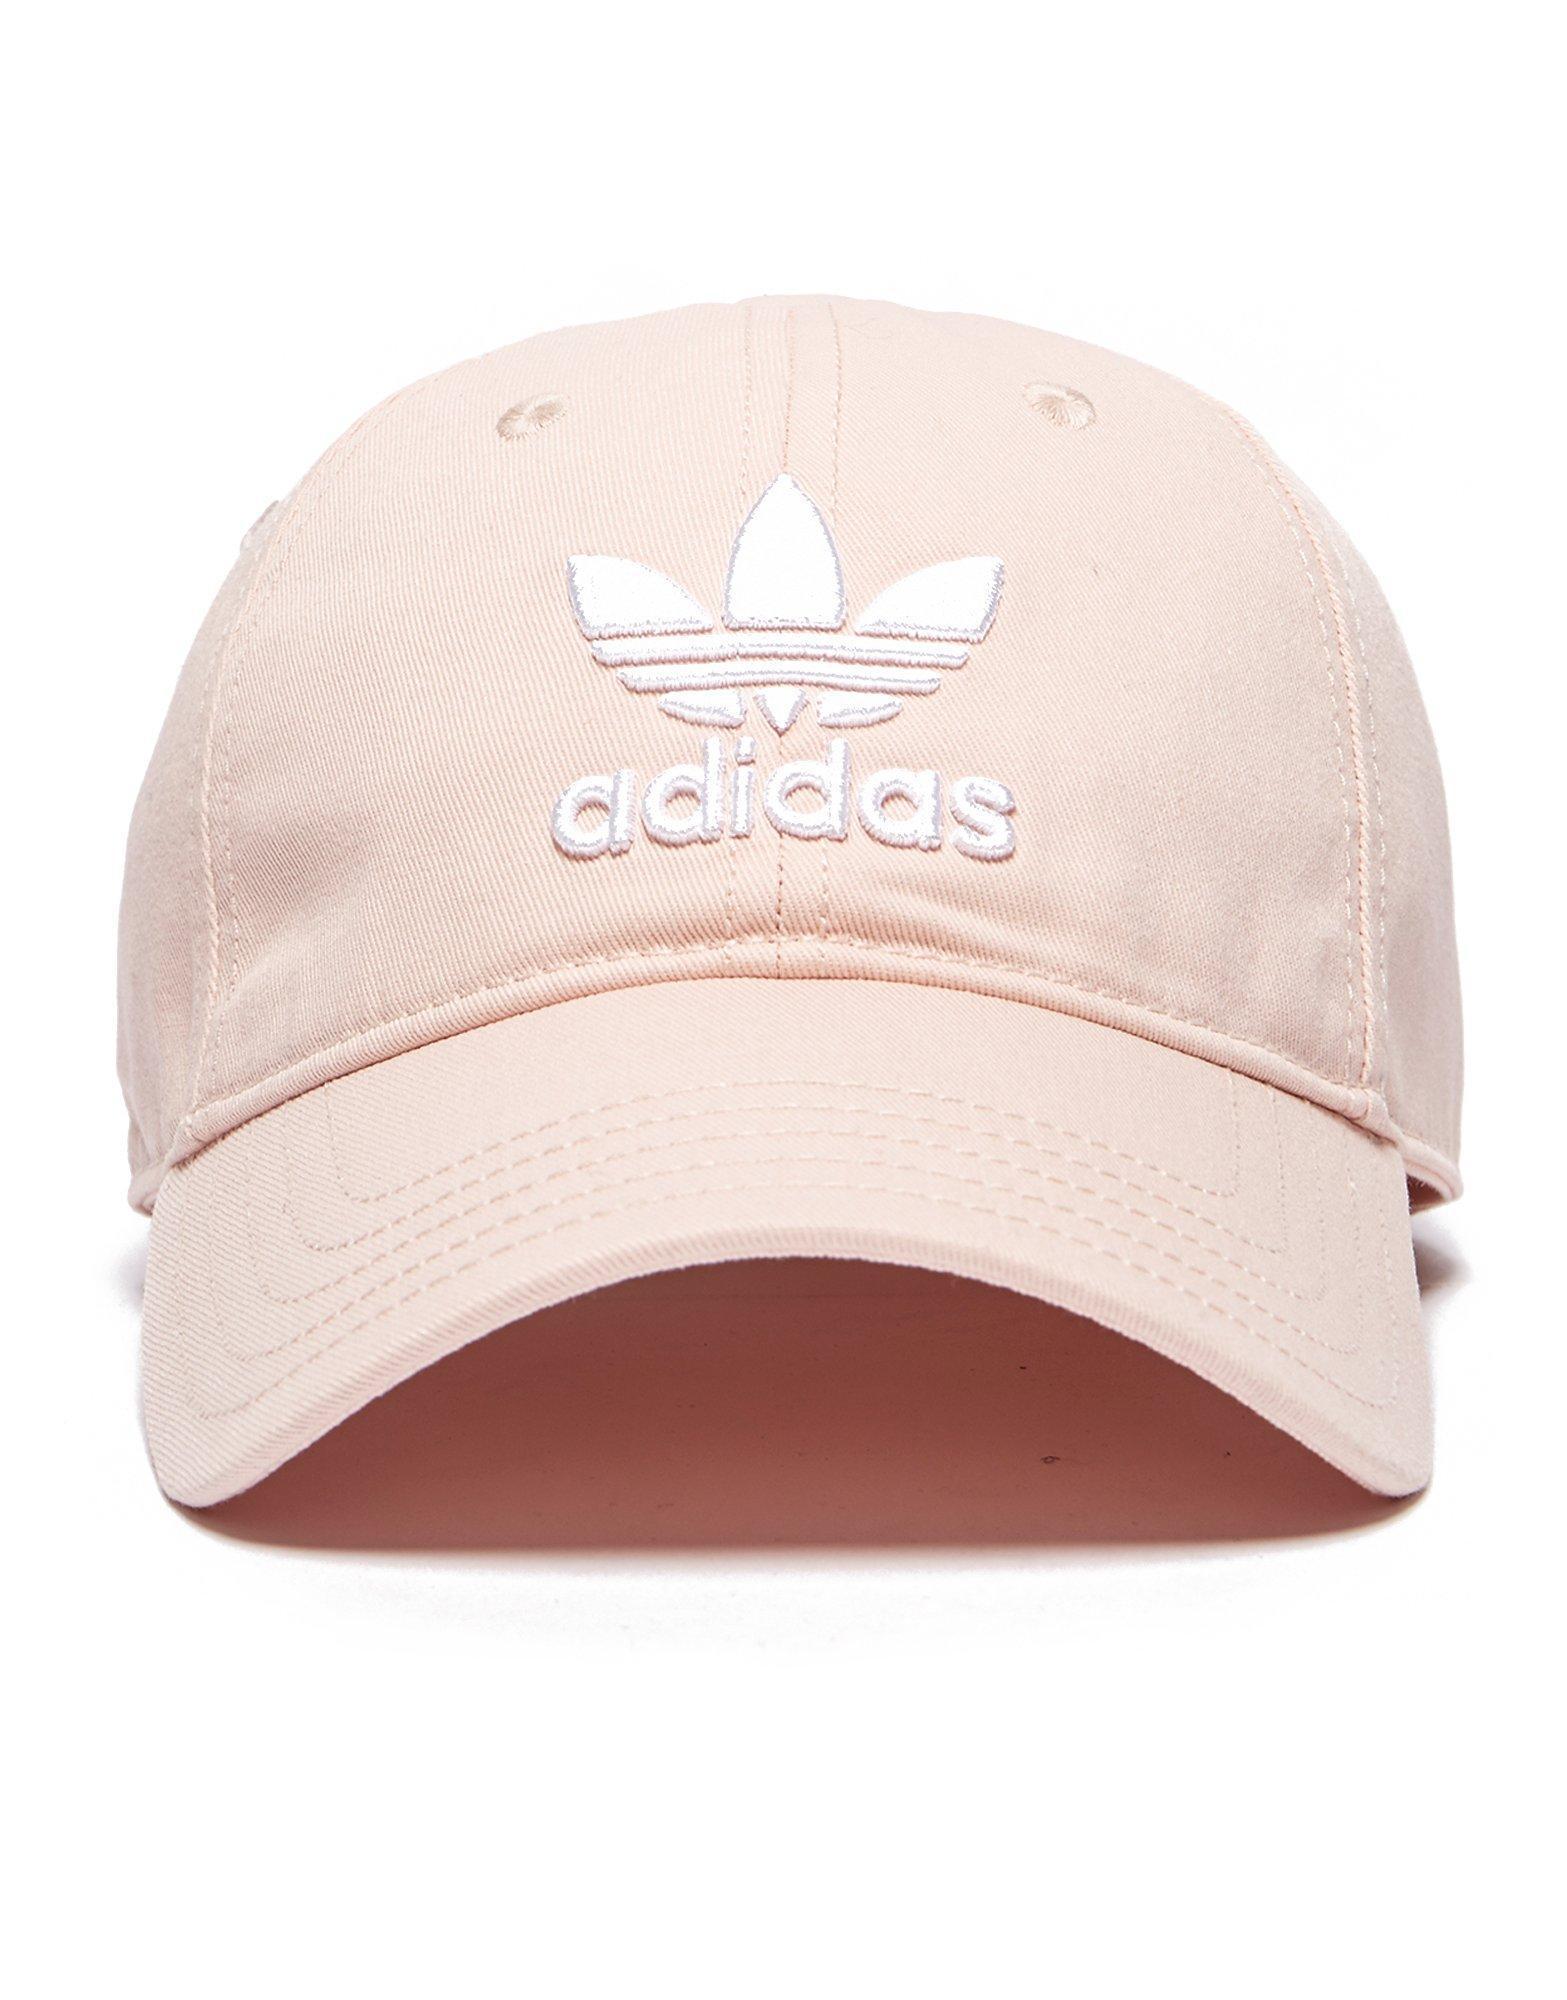 d7b82e75658 Lyst - adidas Originals Trefoil Classic Cap in Pink for Men